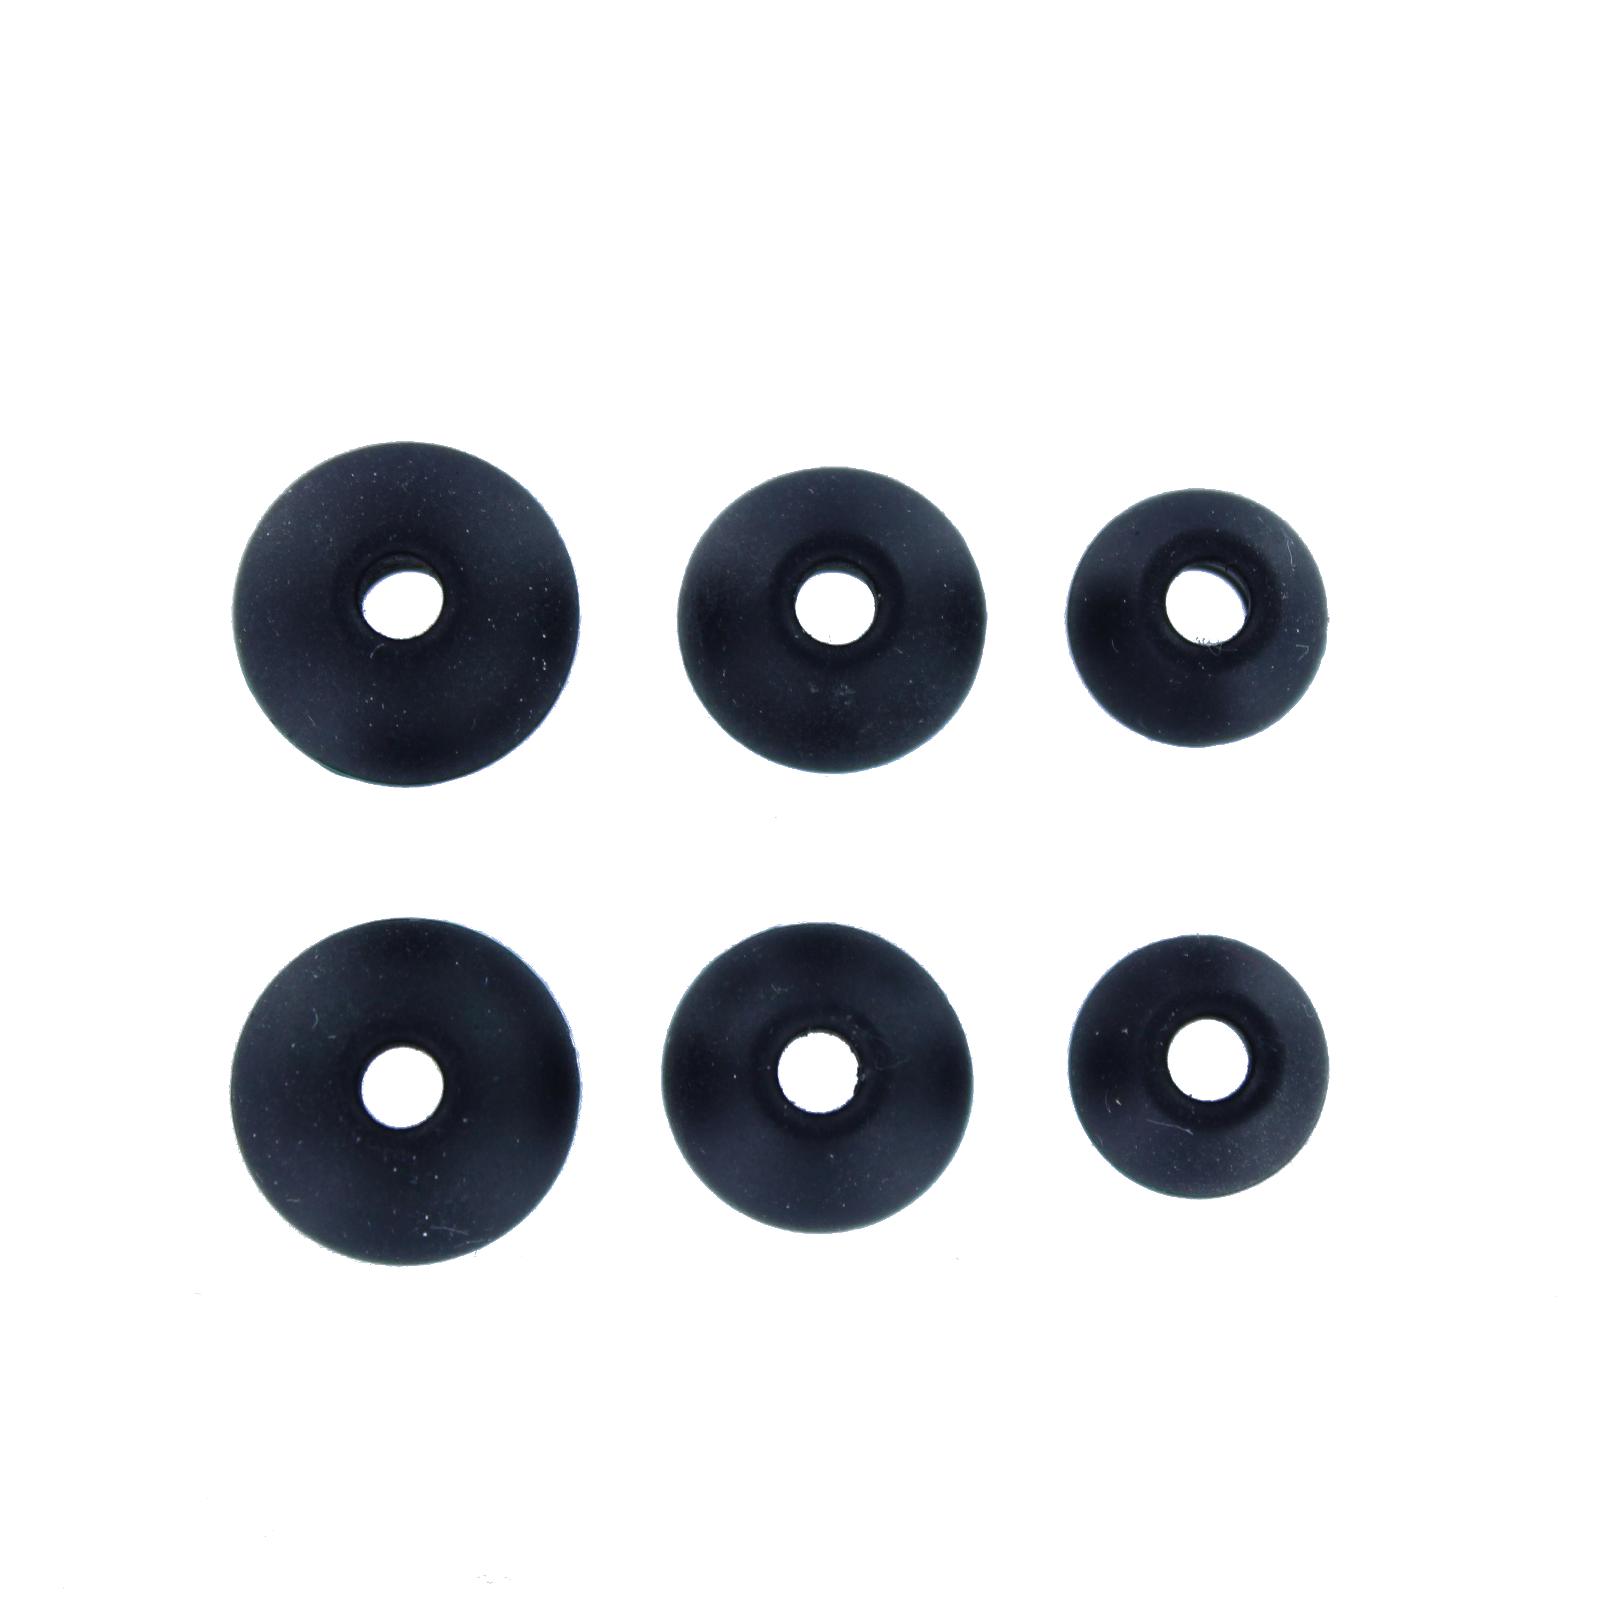 Ear tip set (S+M+L), N20